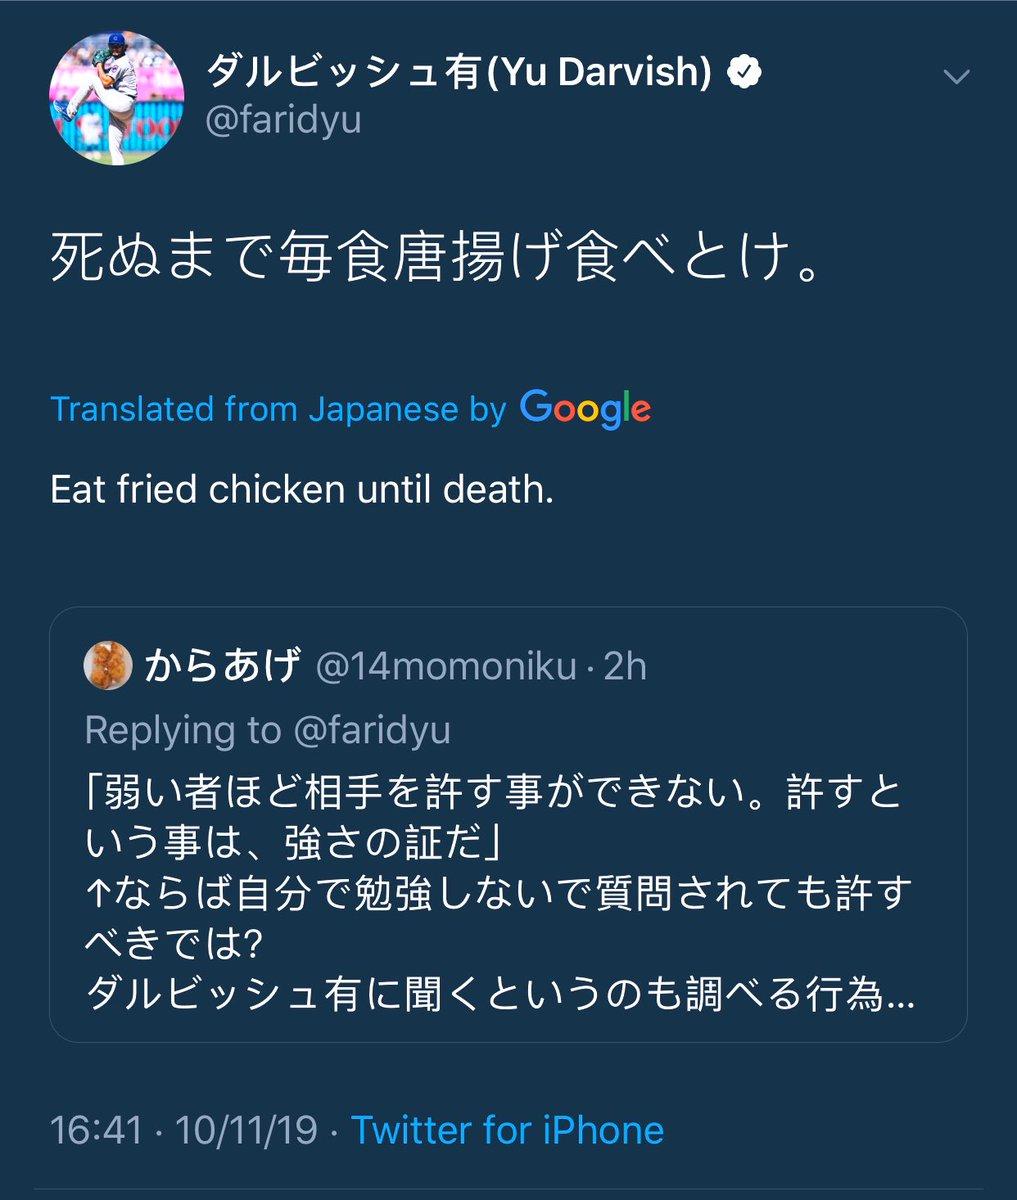 yu darvish told ol dude to eat fried chicken until death lmaoooo — yu's twitter clapback game different 😂